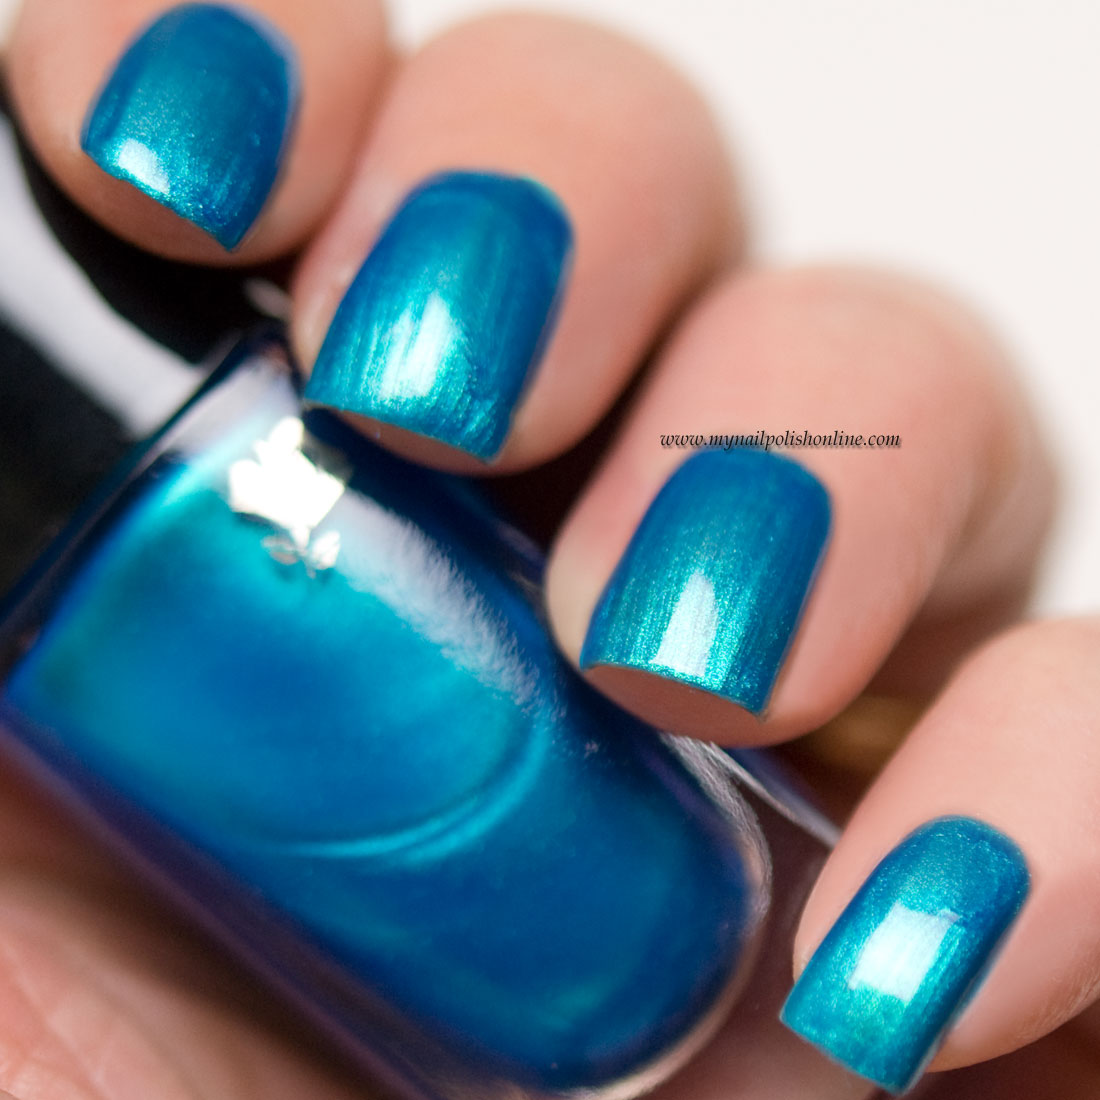 lancome l 39 esprit libre my nail polish online. Black Bedroom Furniture Sets. Home Design Ideas